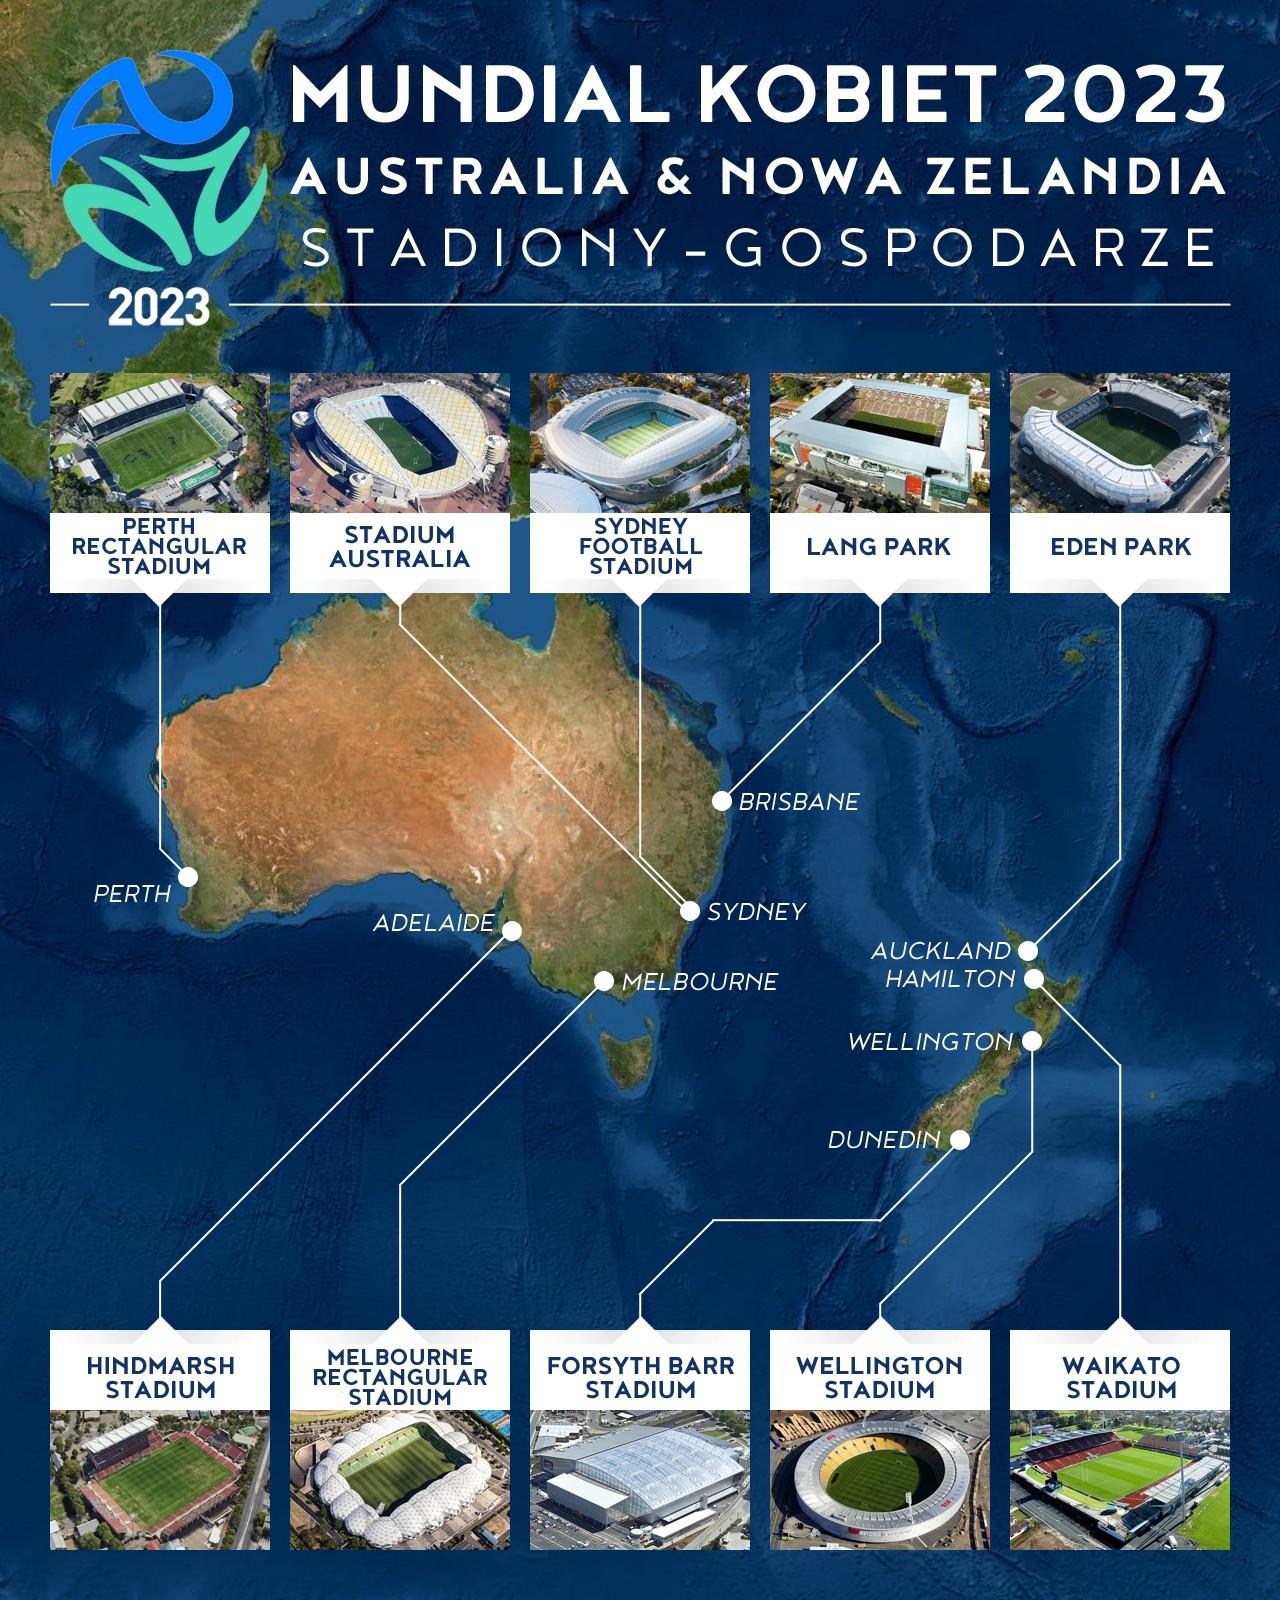 2023 Women's World Cup (Australia & New Zealand) host venues